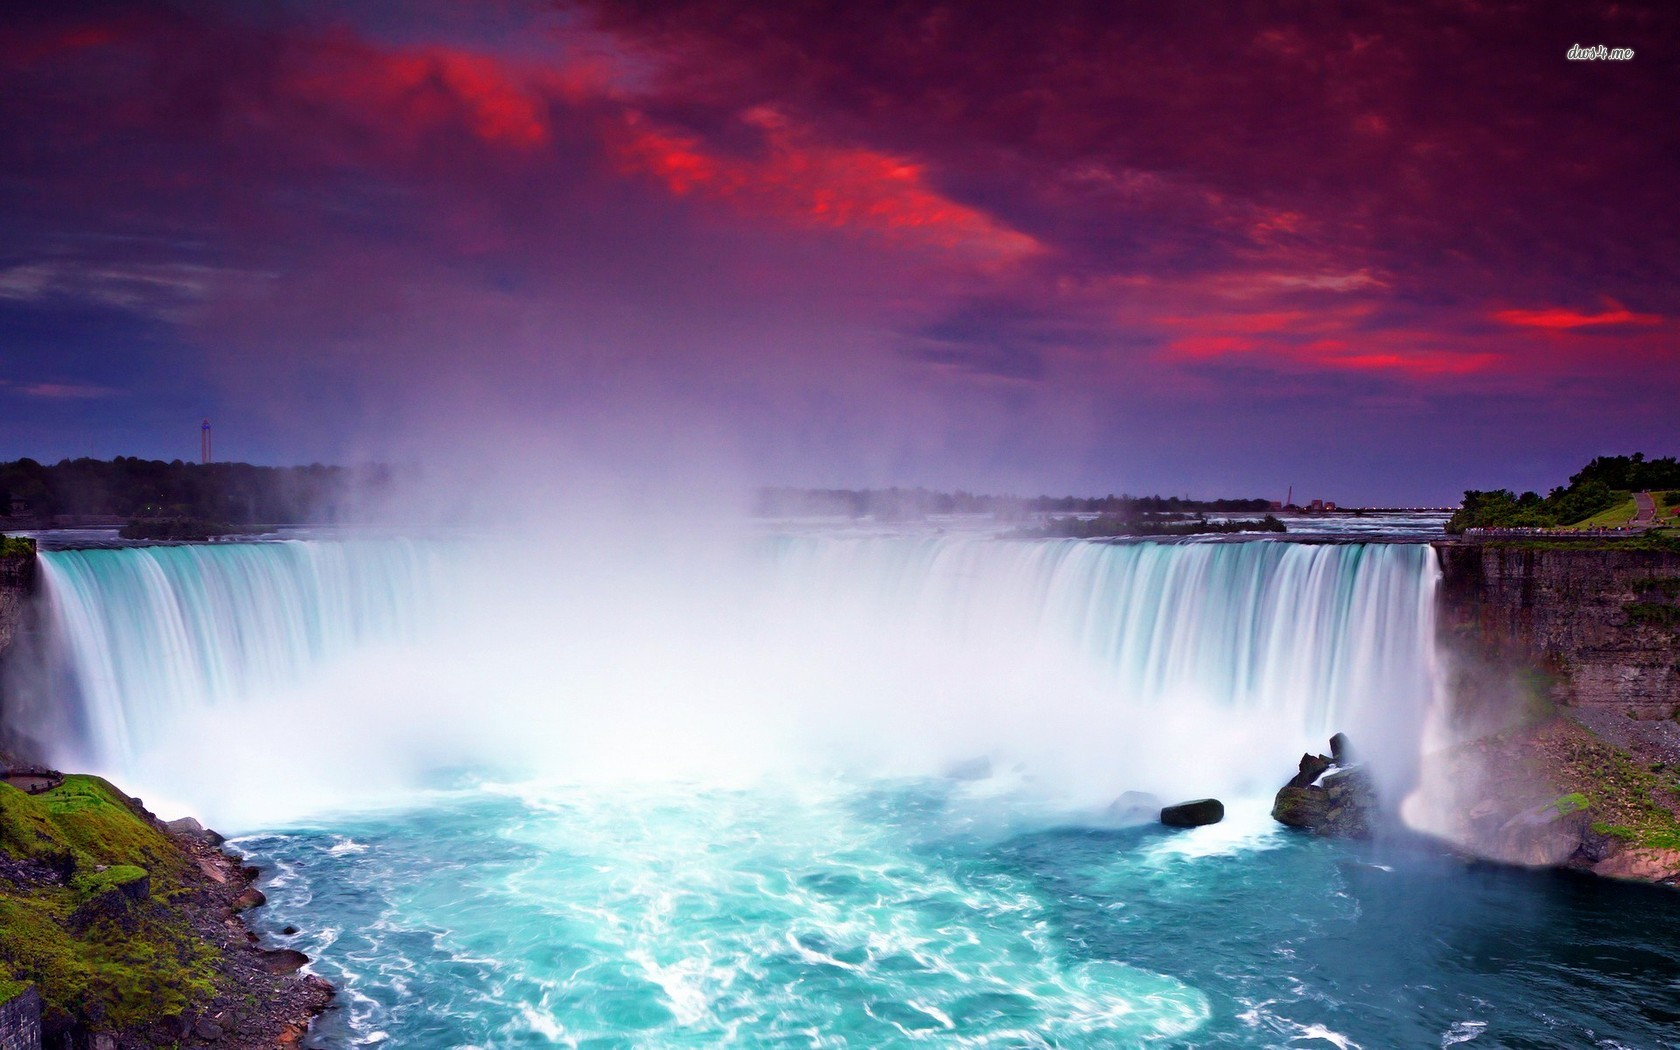 Niagara Falls wallpaper   Nature wallpapers   11118 1680x1050